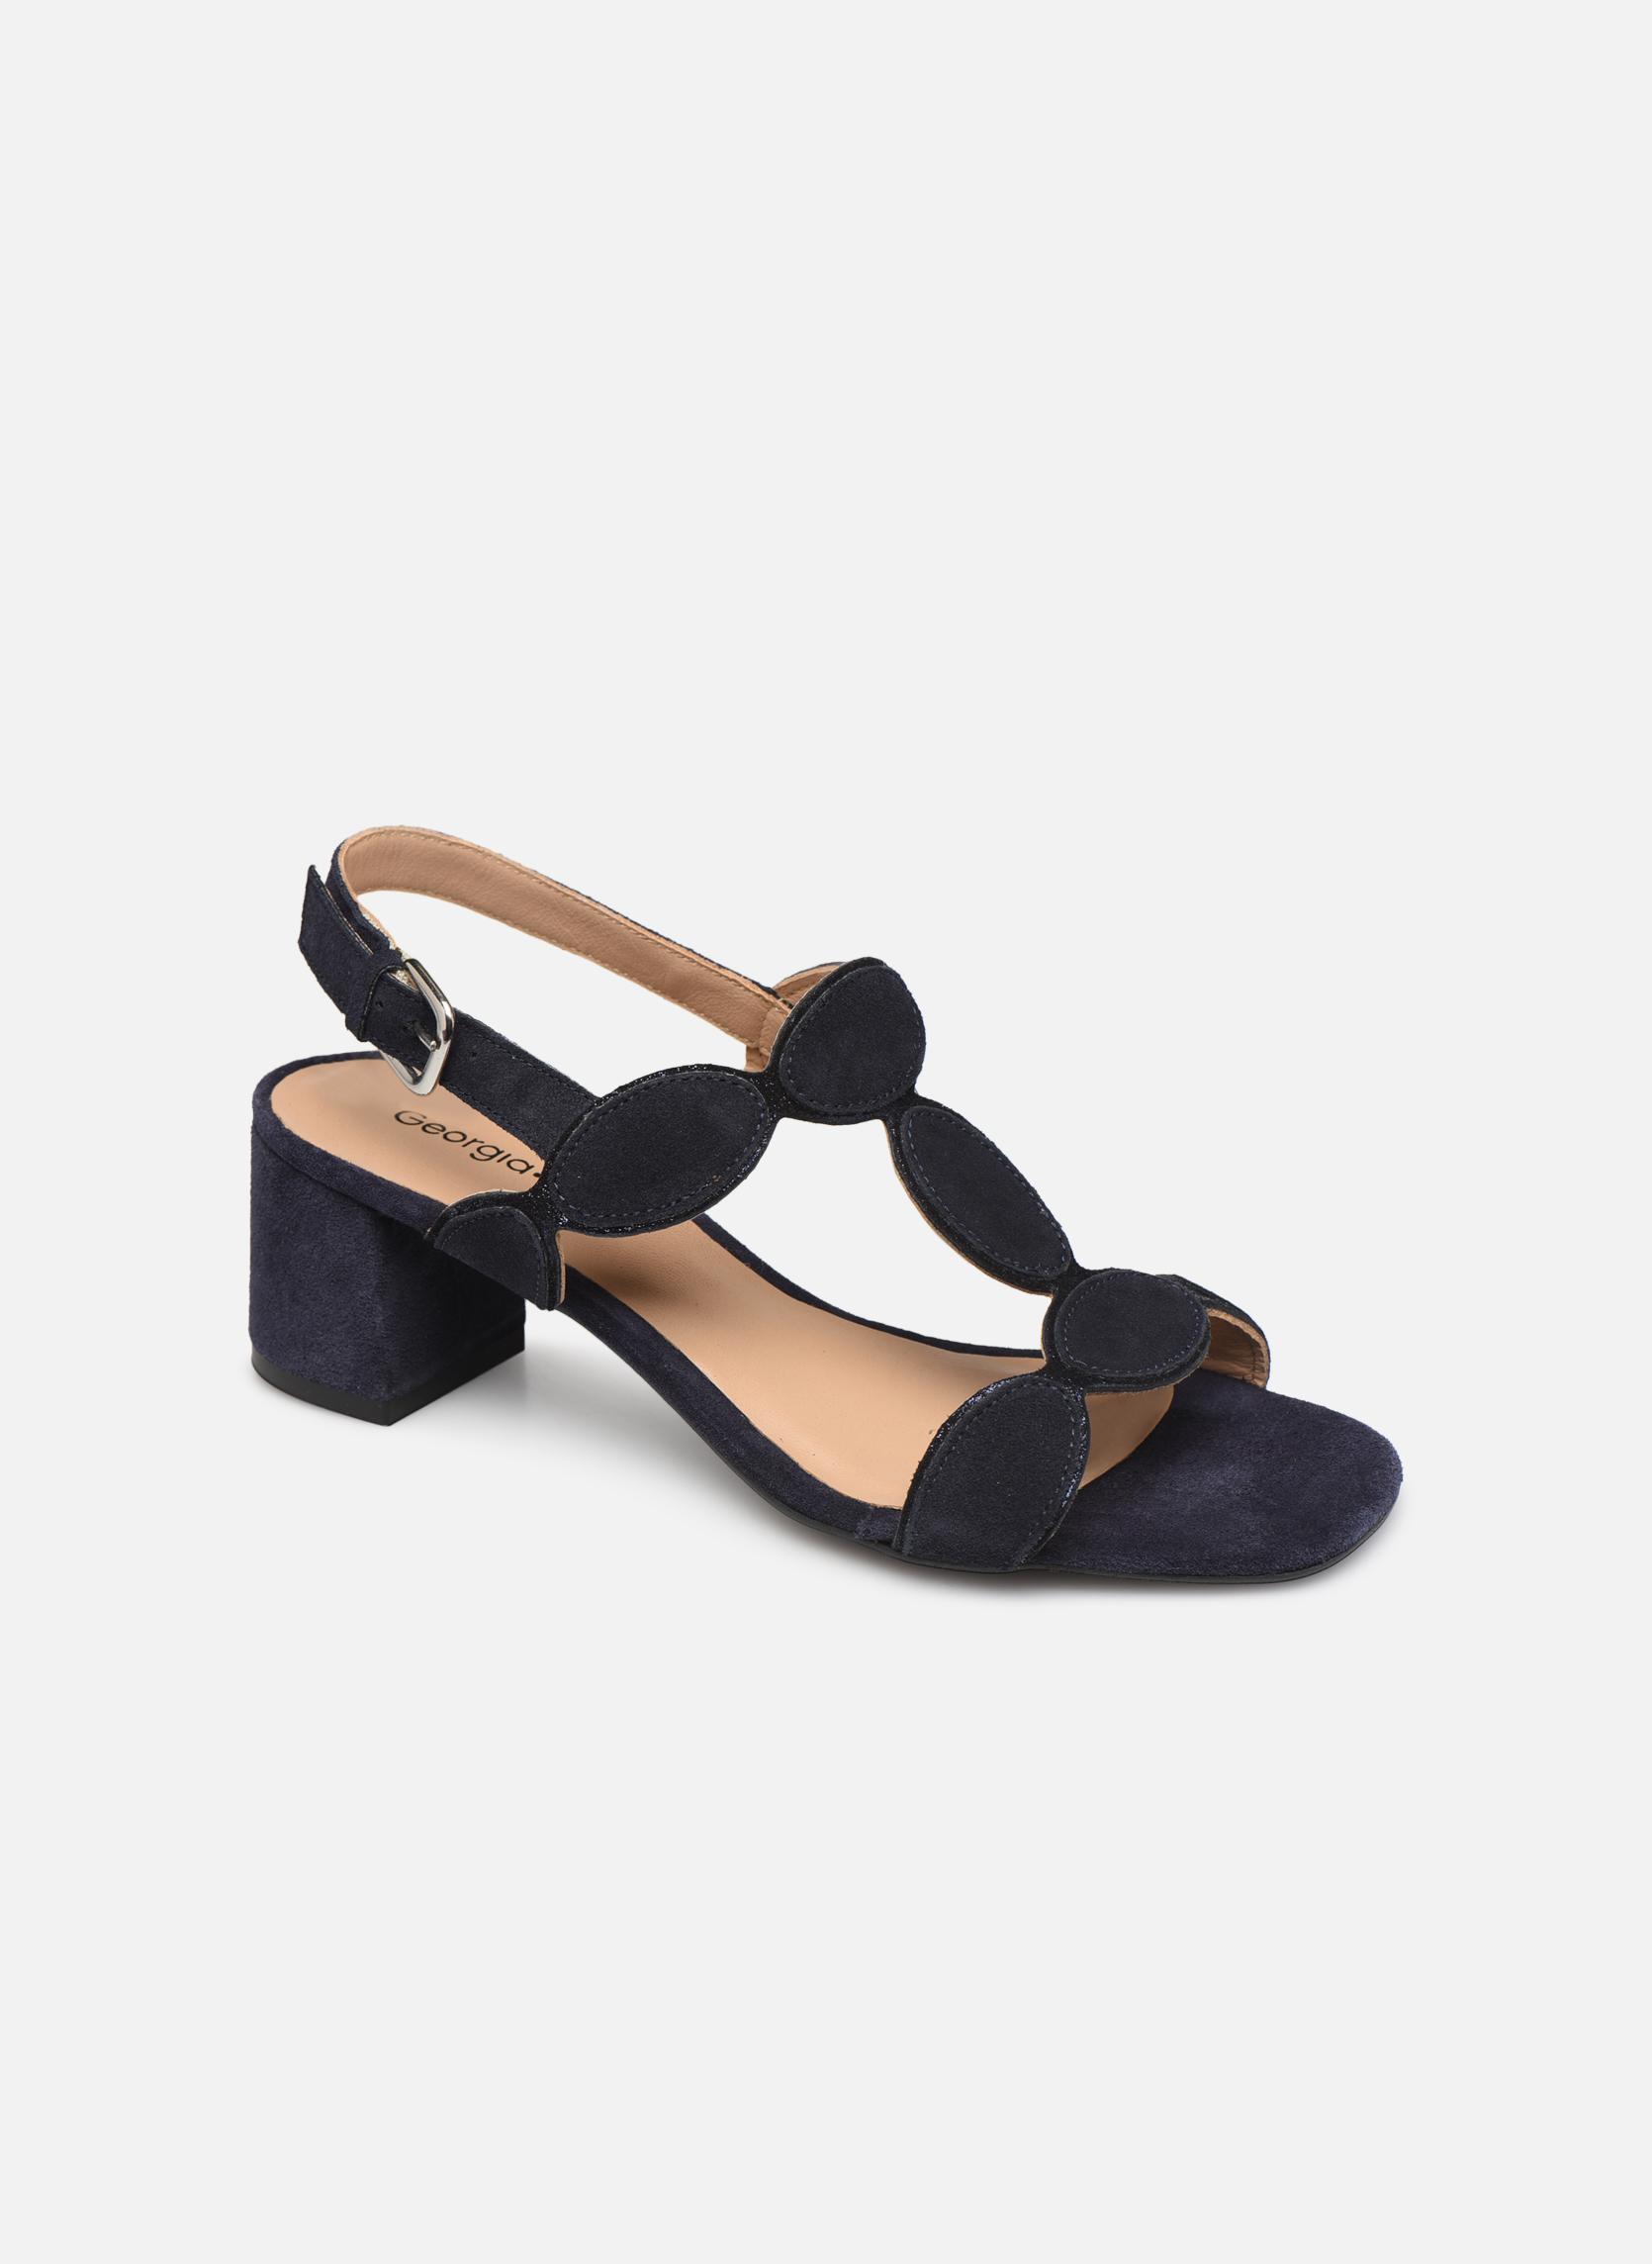 Grandes descuentos últimos zapatos Georgia Rose Covala (Negro) - Sandalias Descuento